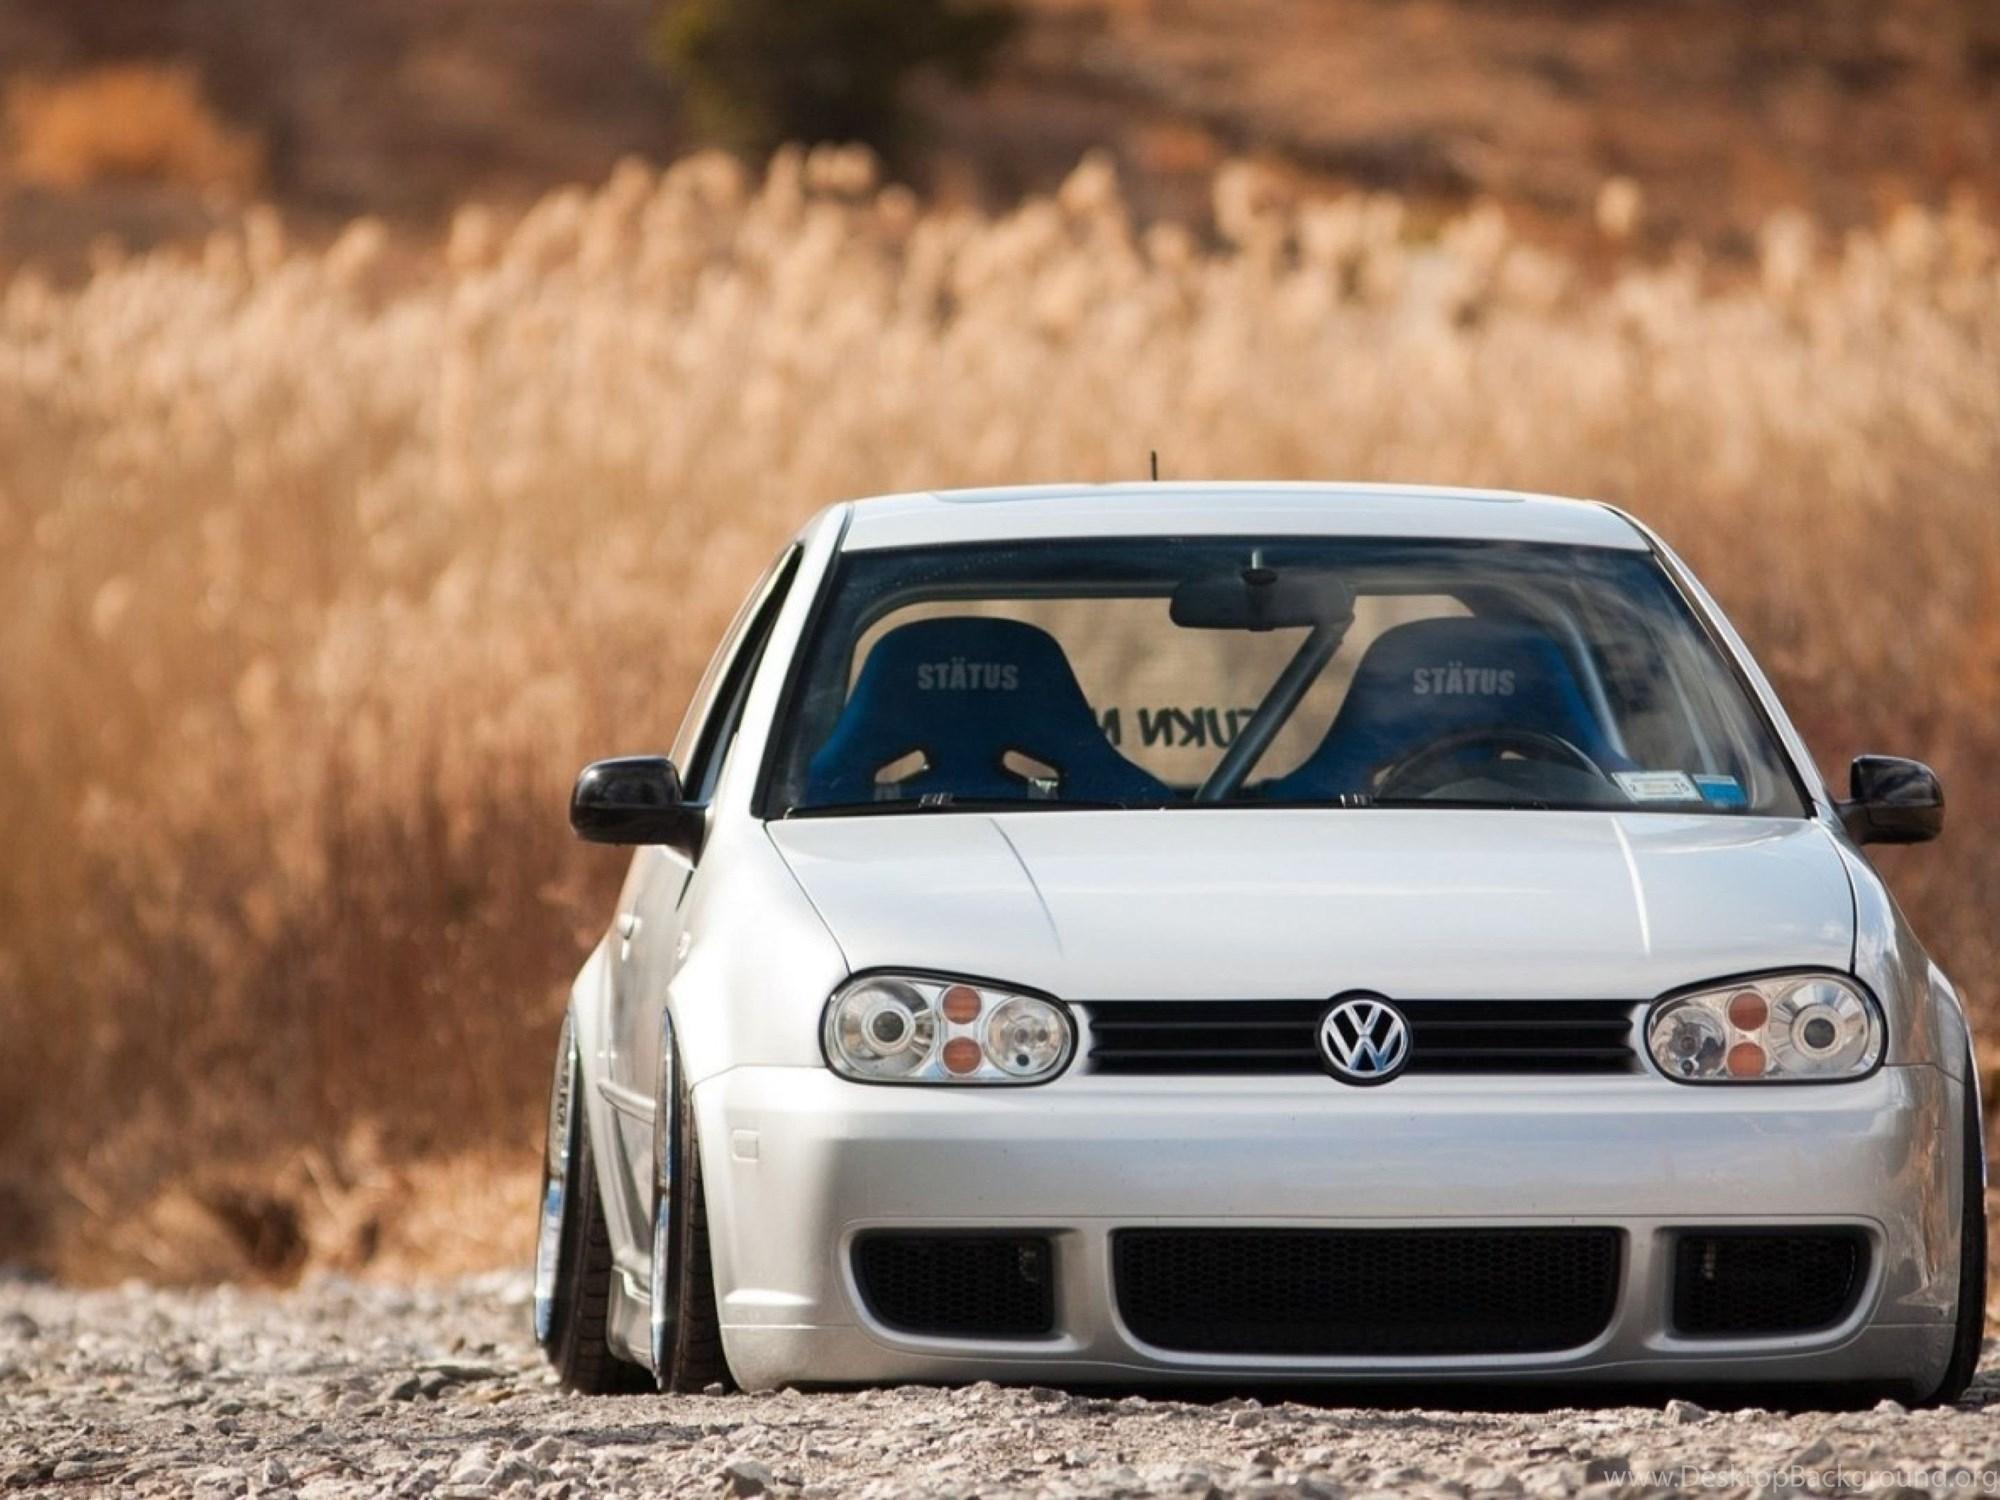 Volkswagen GOLF R32 Wallpapers 4K (4096x2160) Resolution